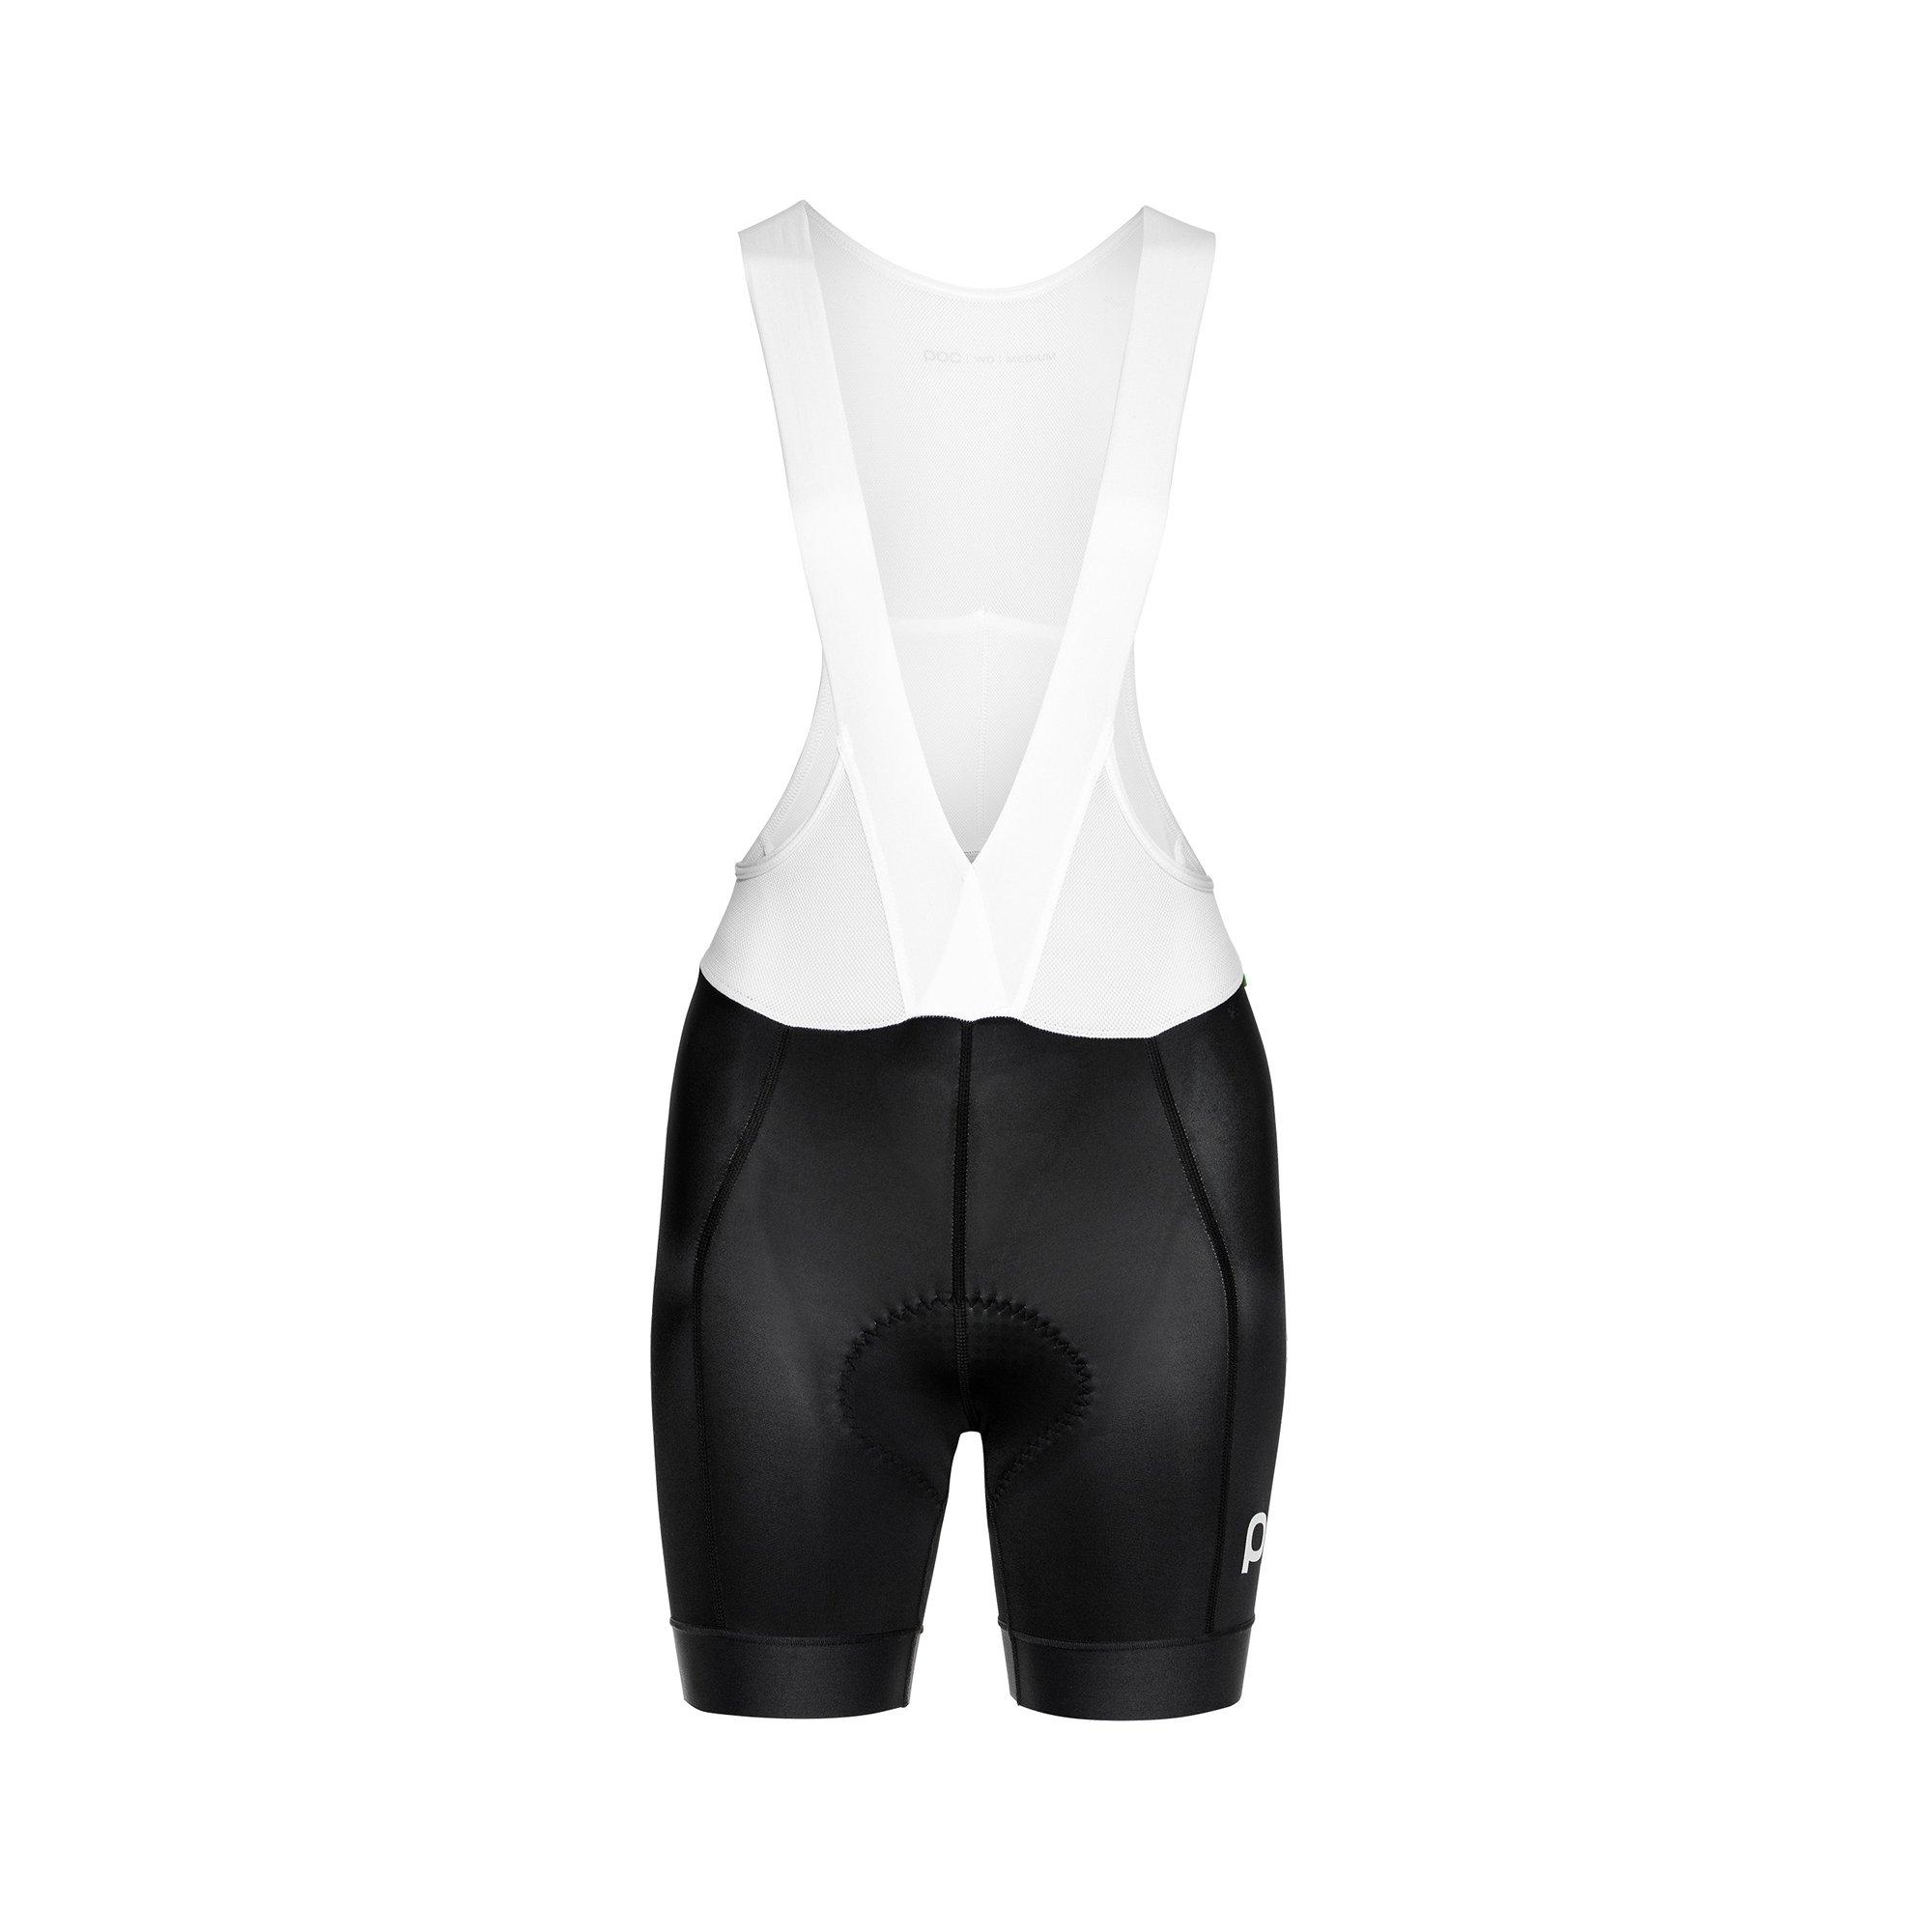 POC Essential Road Women Bib Shorts, Women's Cycling Apparel, Uranium Black, L